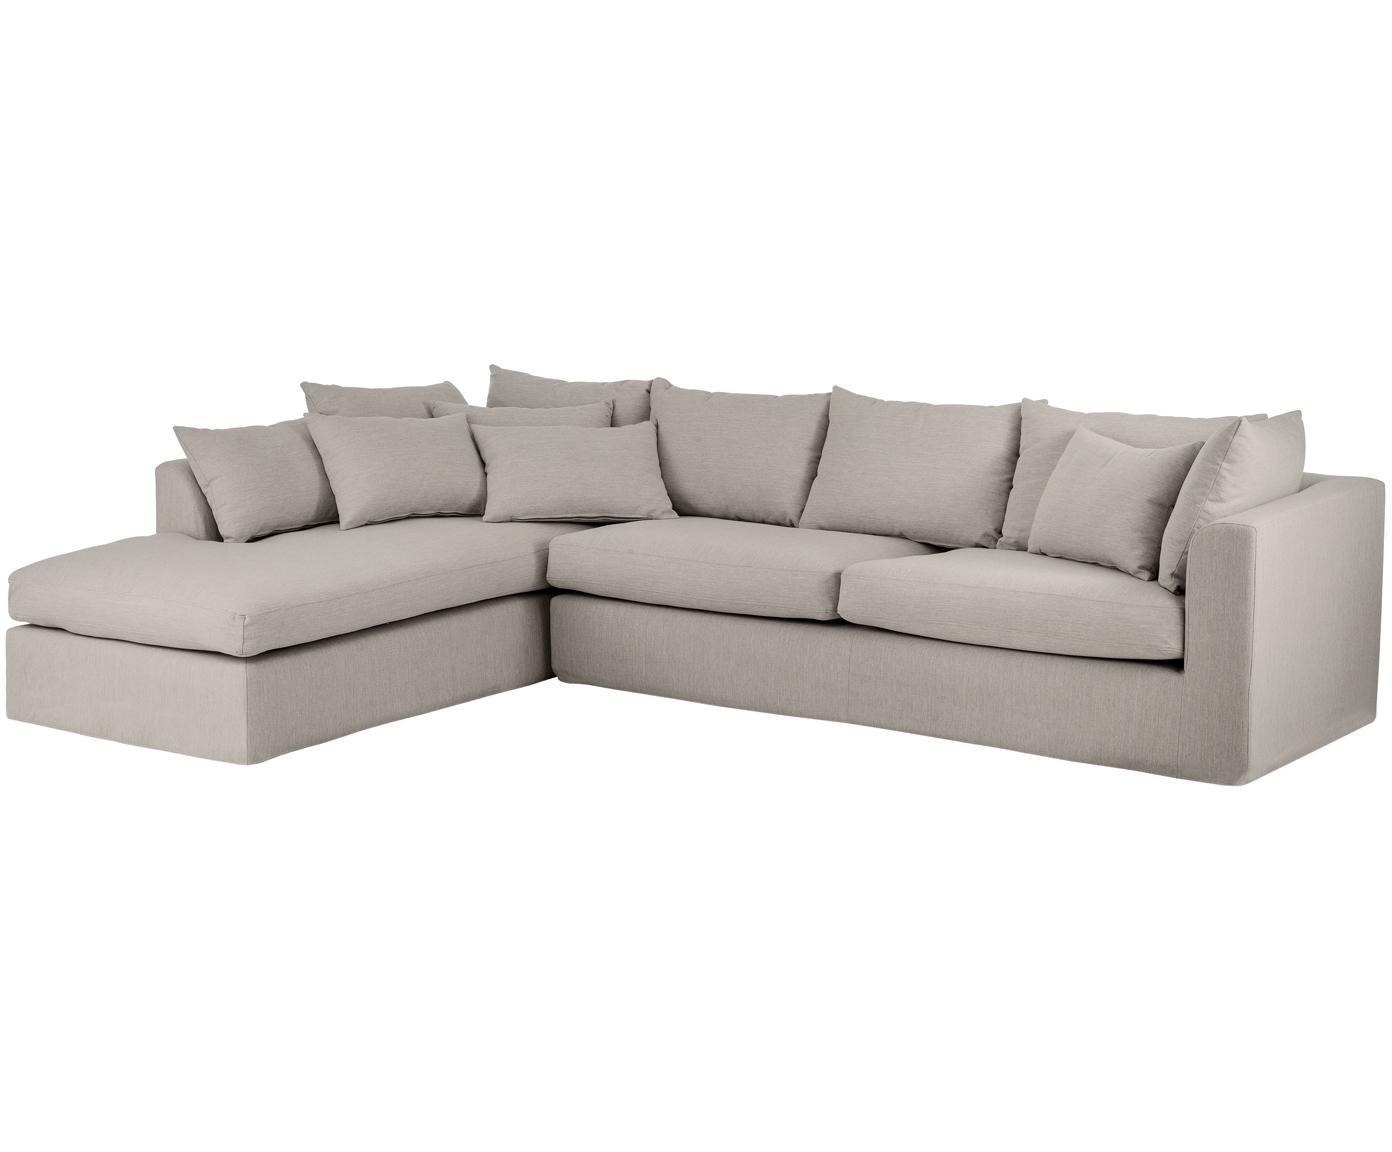 Canapé d'angle Zach, Tissu taupe